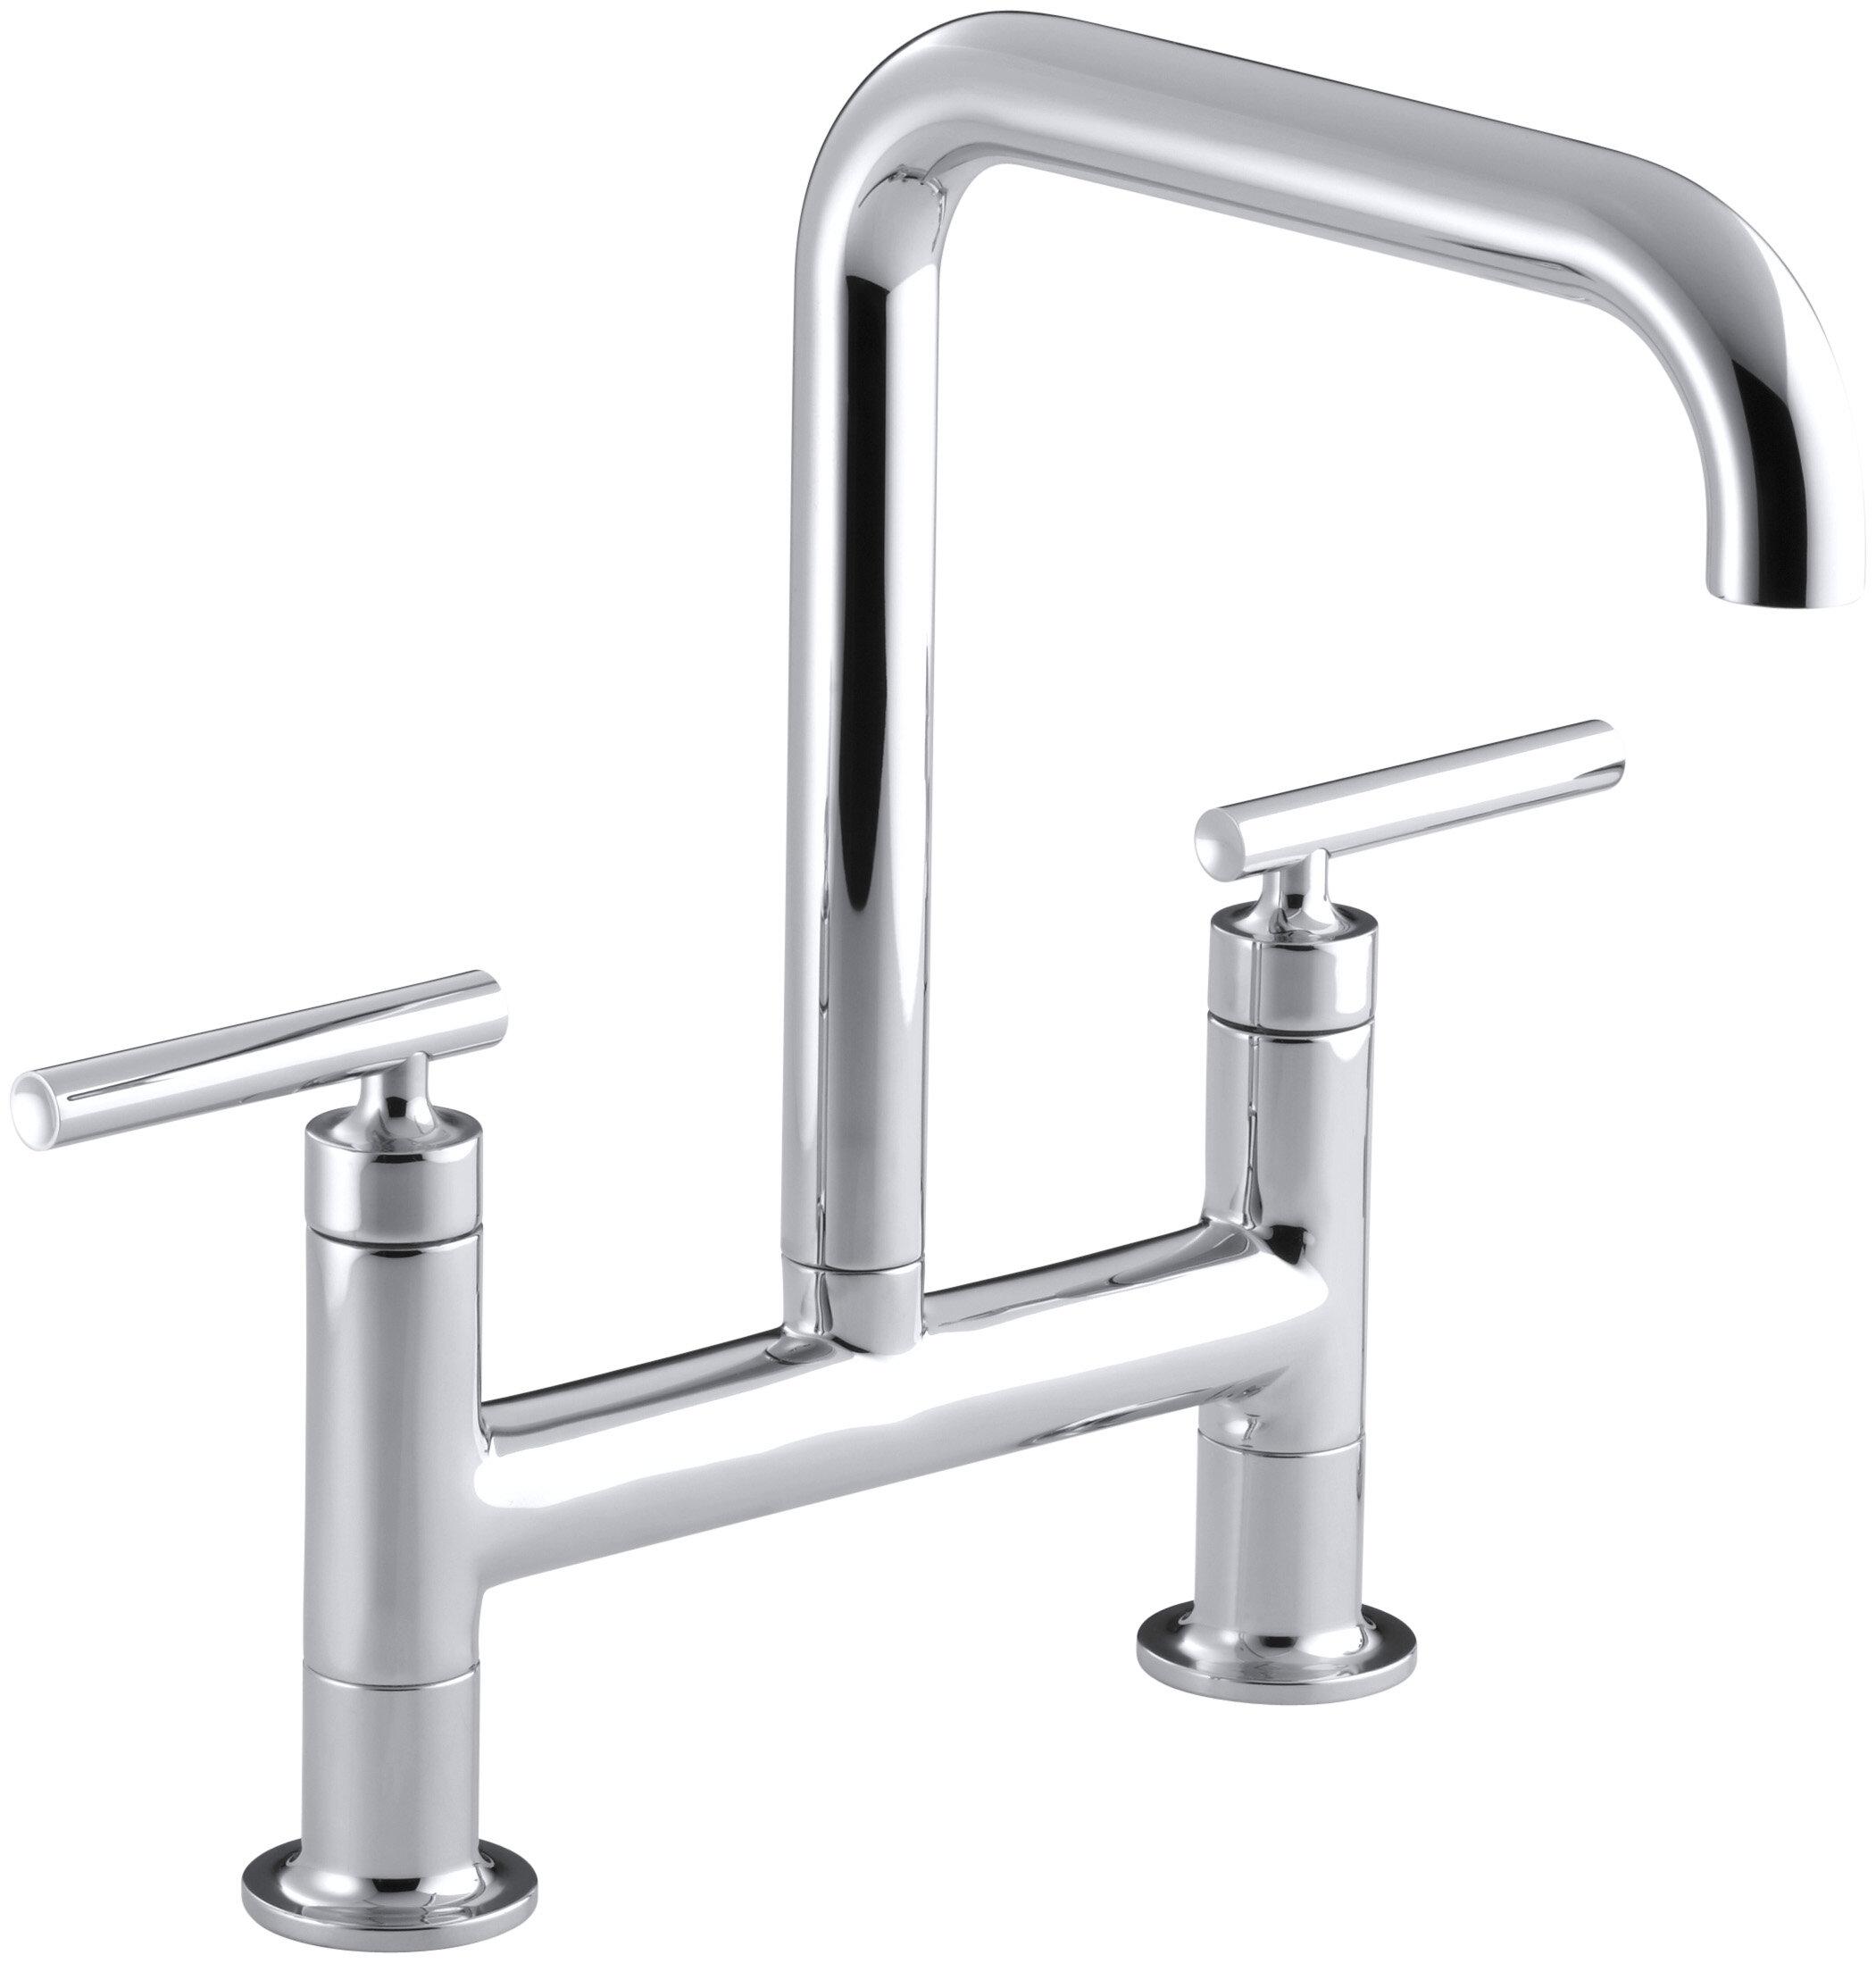 K 7547 4 BL,CP,SN Kohler Purist Two Hole Deck Mount Bridge Kitchen Sink  Faucet U0026 Reviews | Wayfair